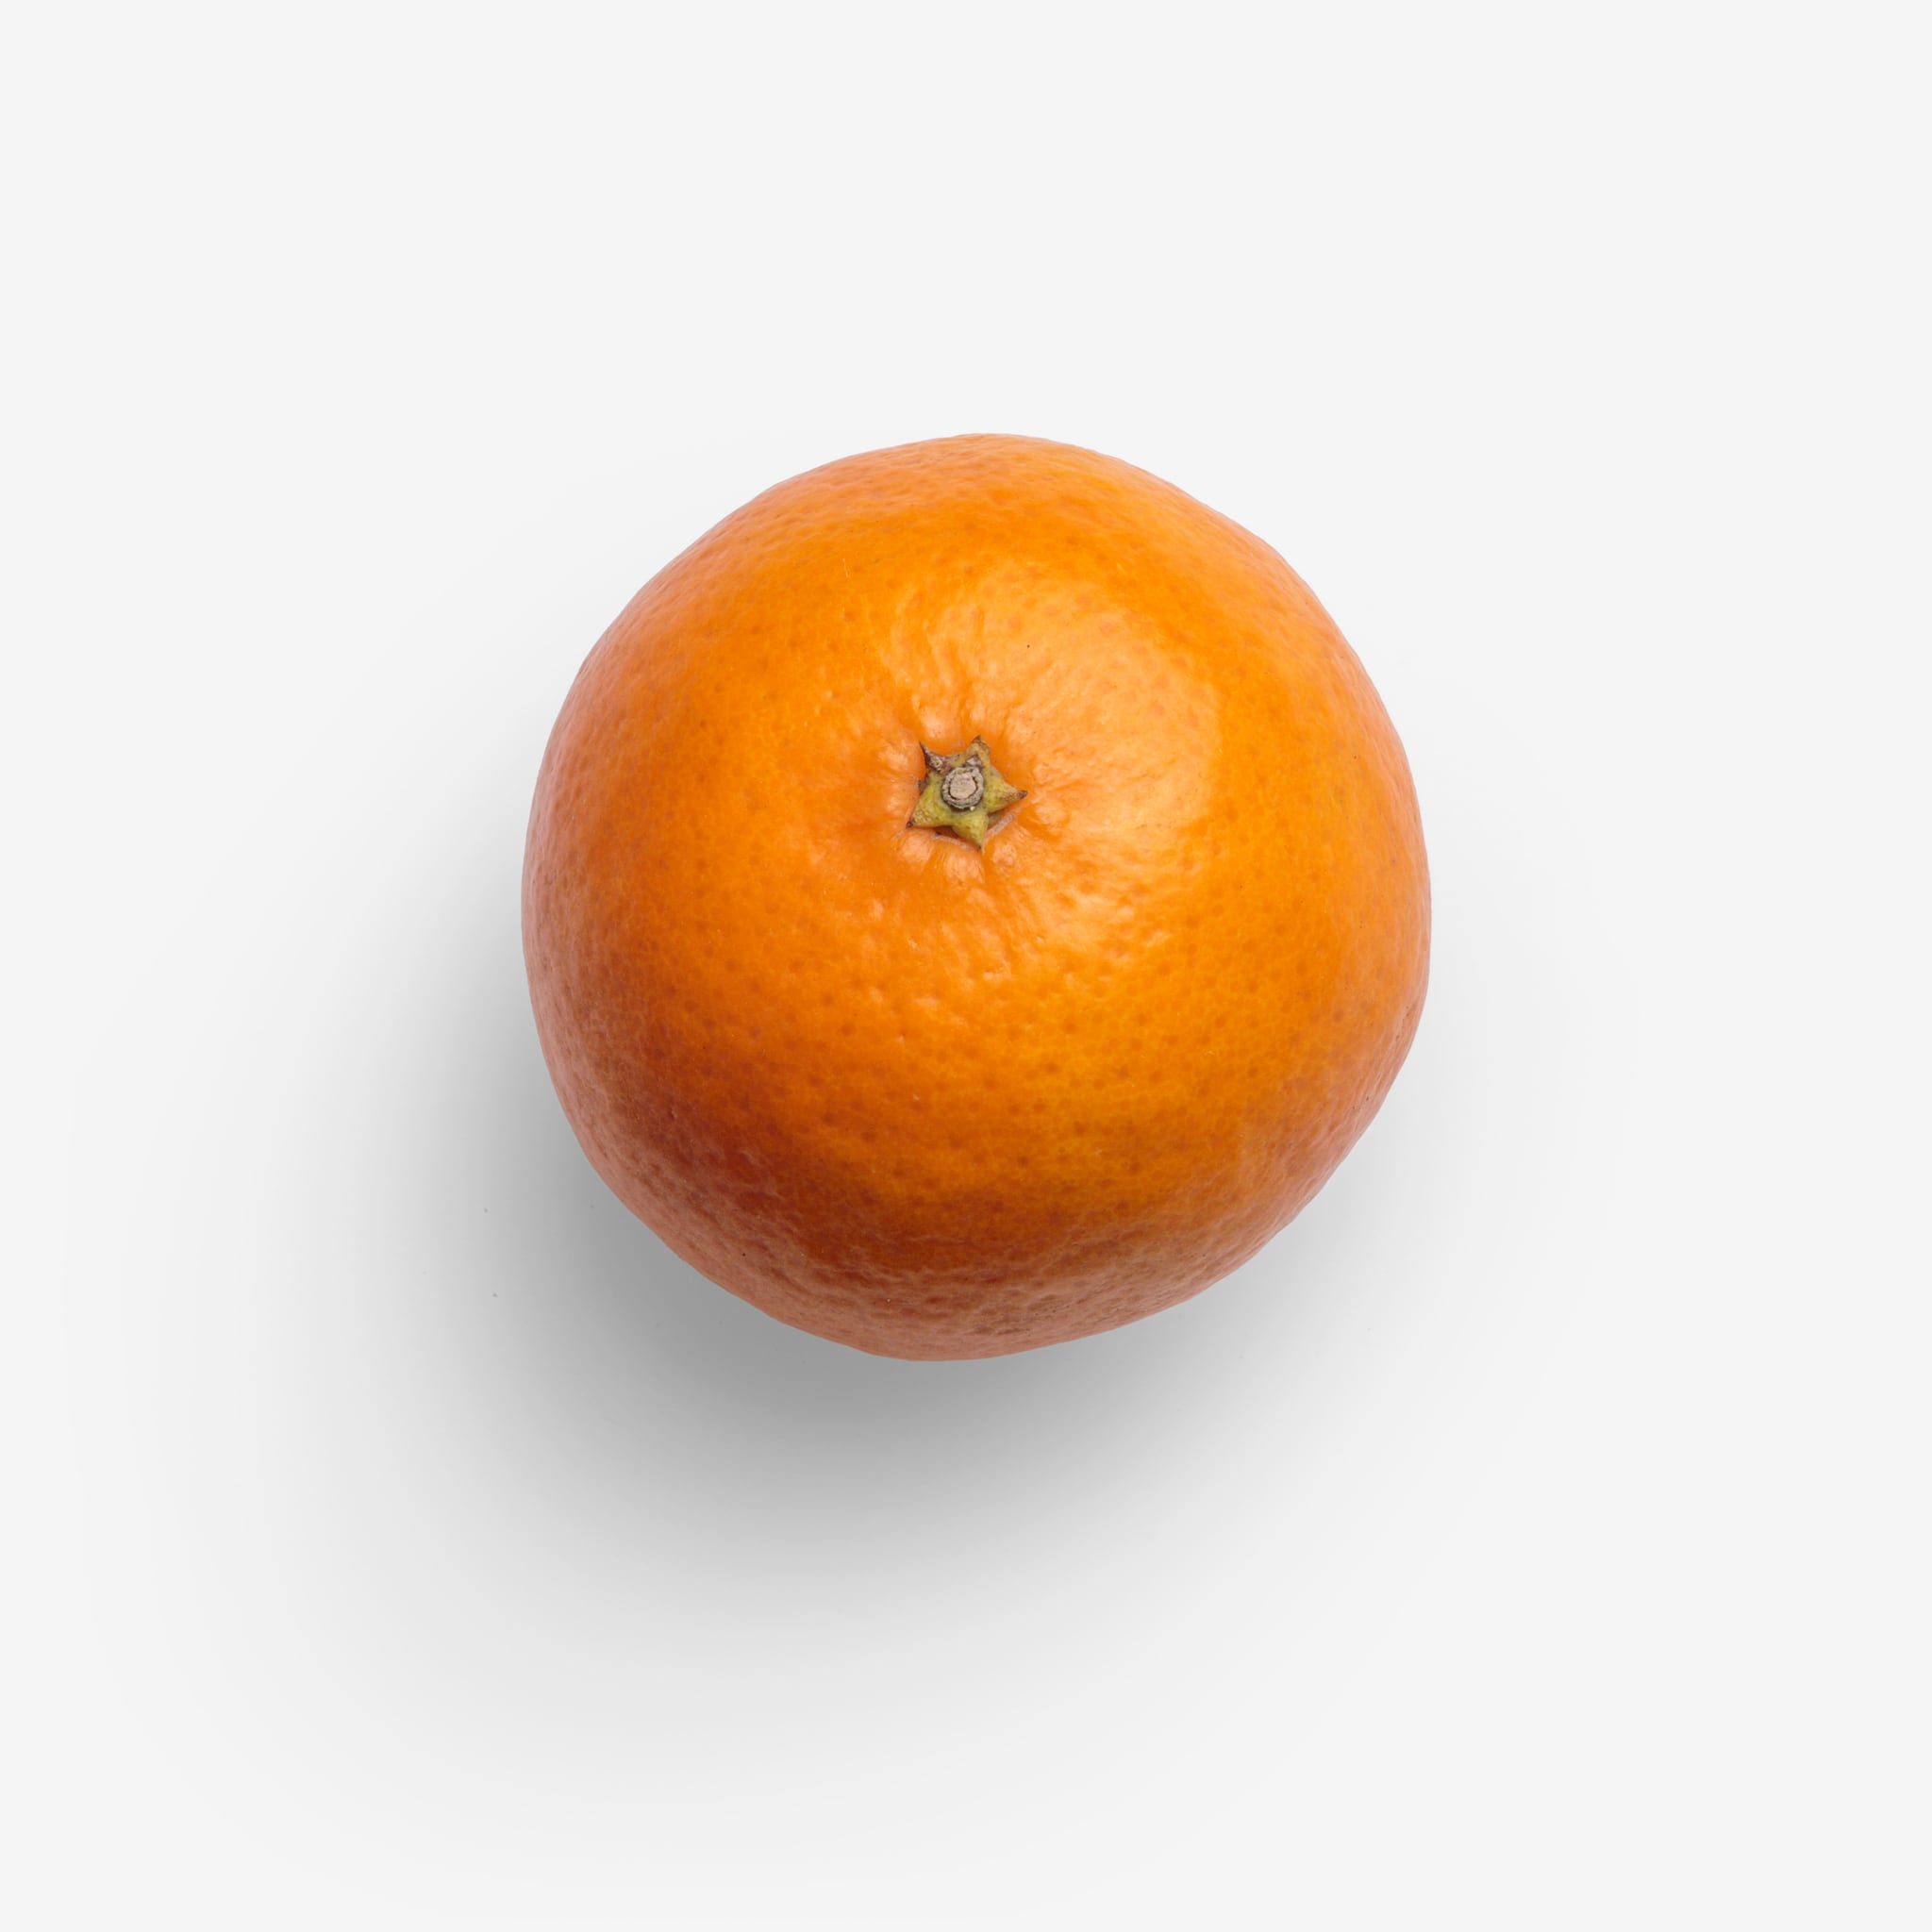 Orange PSD layered image